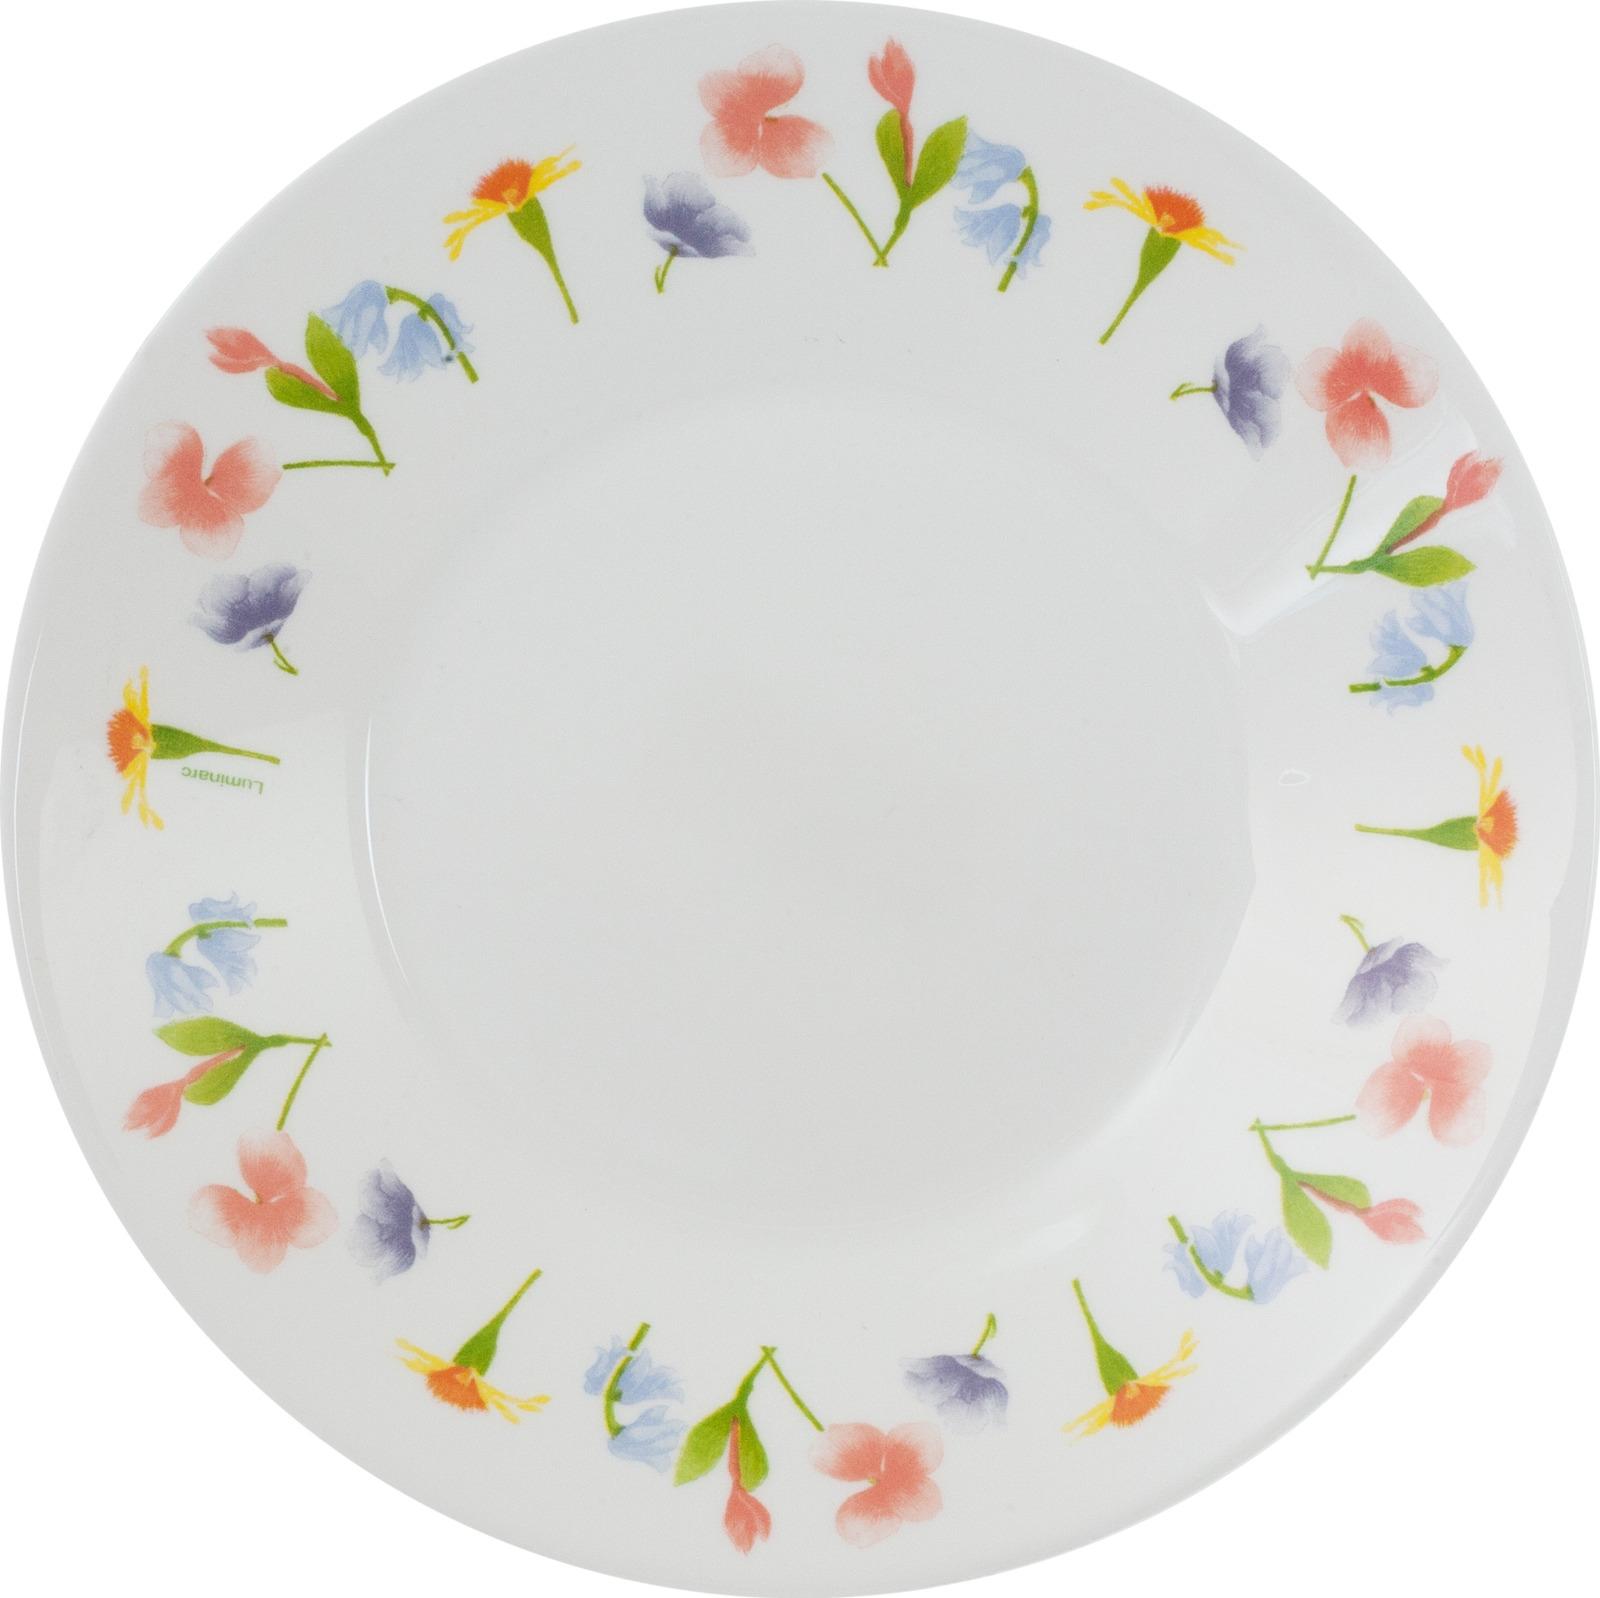 Тарелка глубокая Luminarc Армуаз, N1014, белый, диаметр 23 см тарелка глубокая luminarc ализэ перл n4836 белый диаметр 23 см